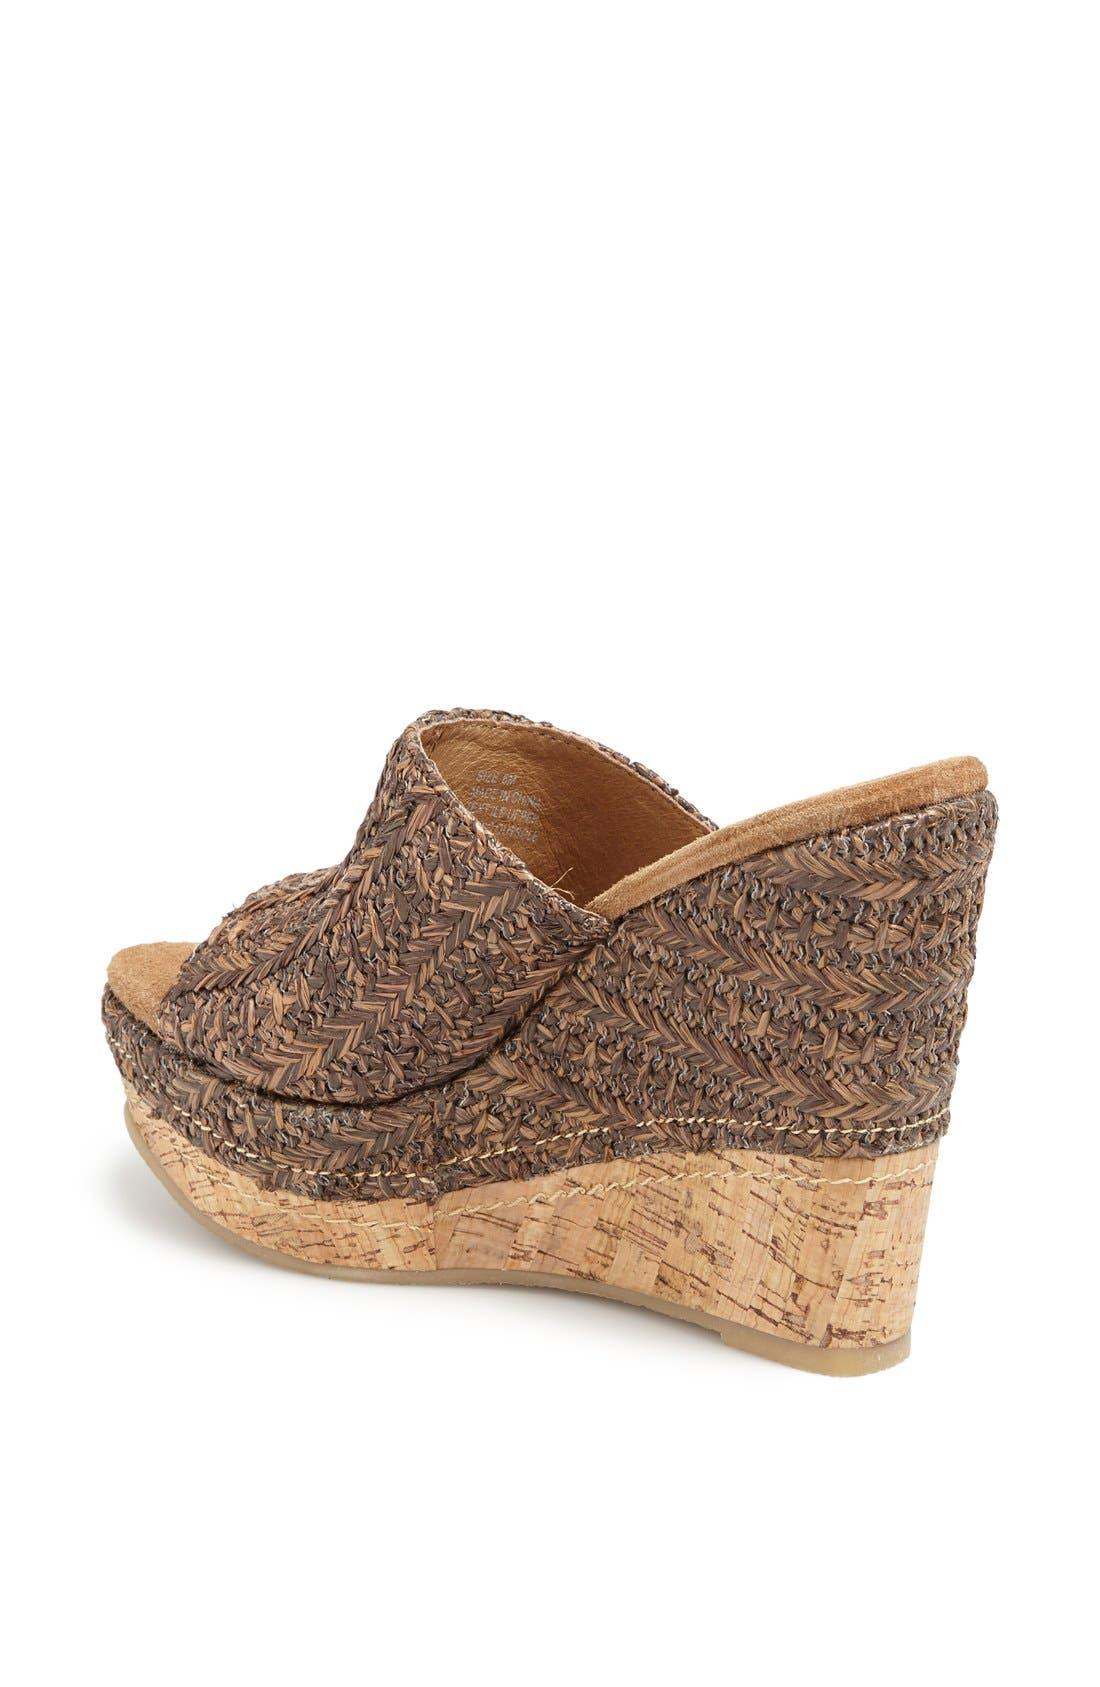 Alternate Image 2  - Very Volatile 'Sandstone' Wedge Sandal